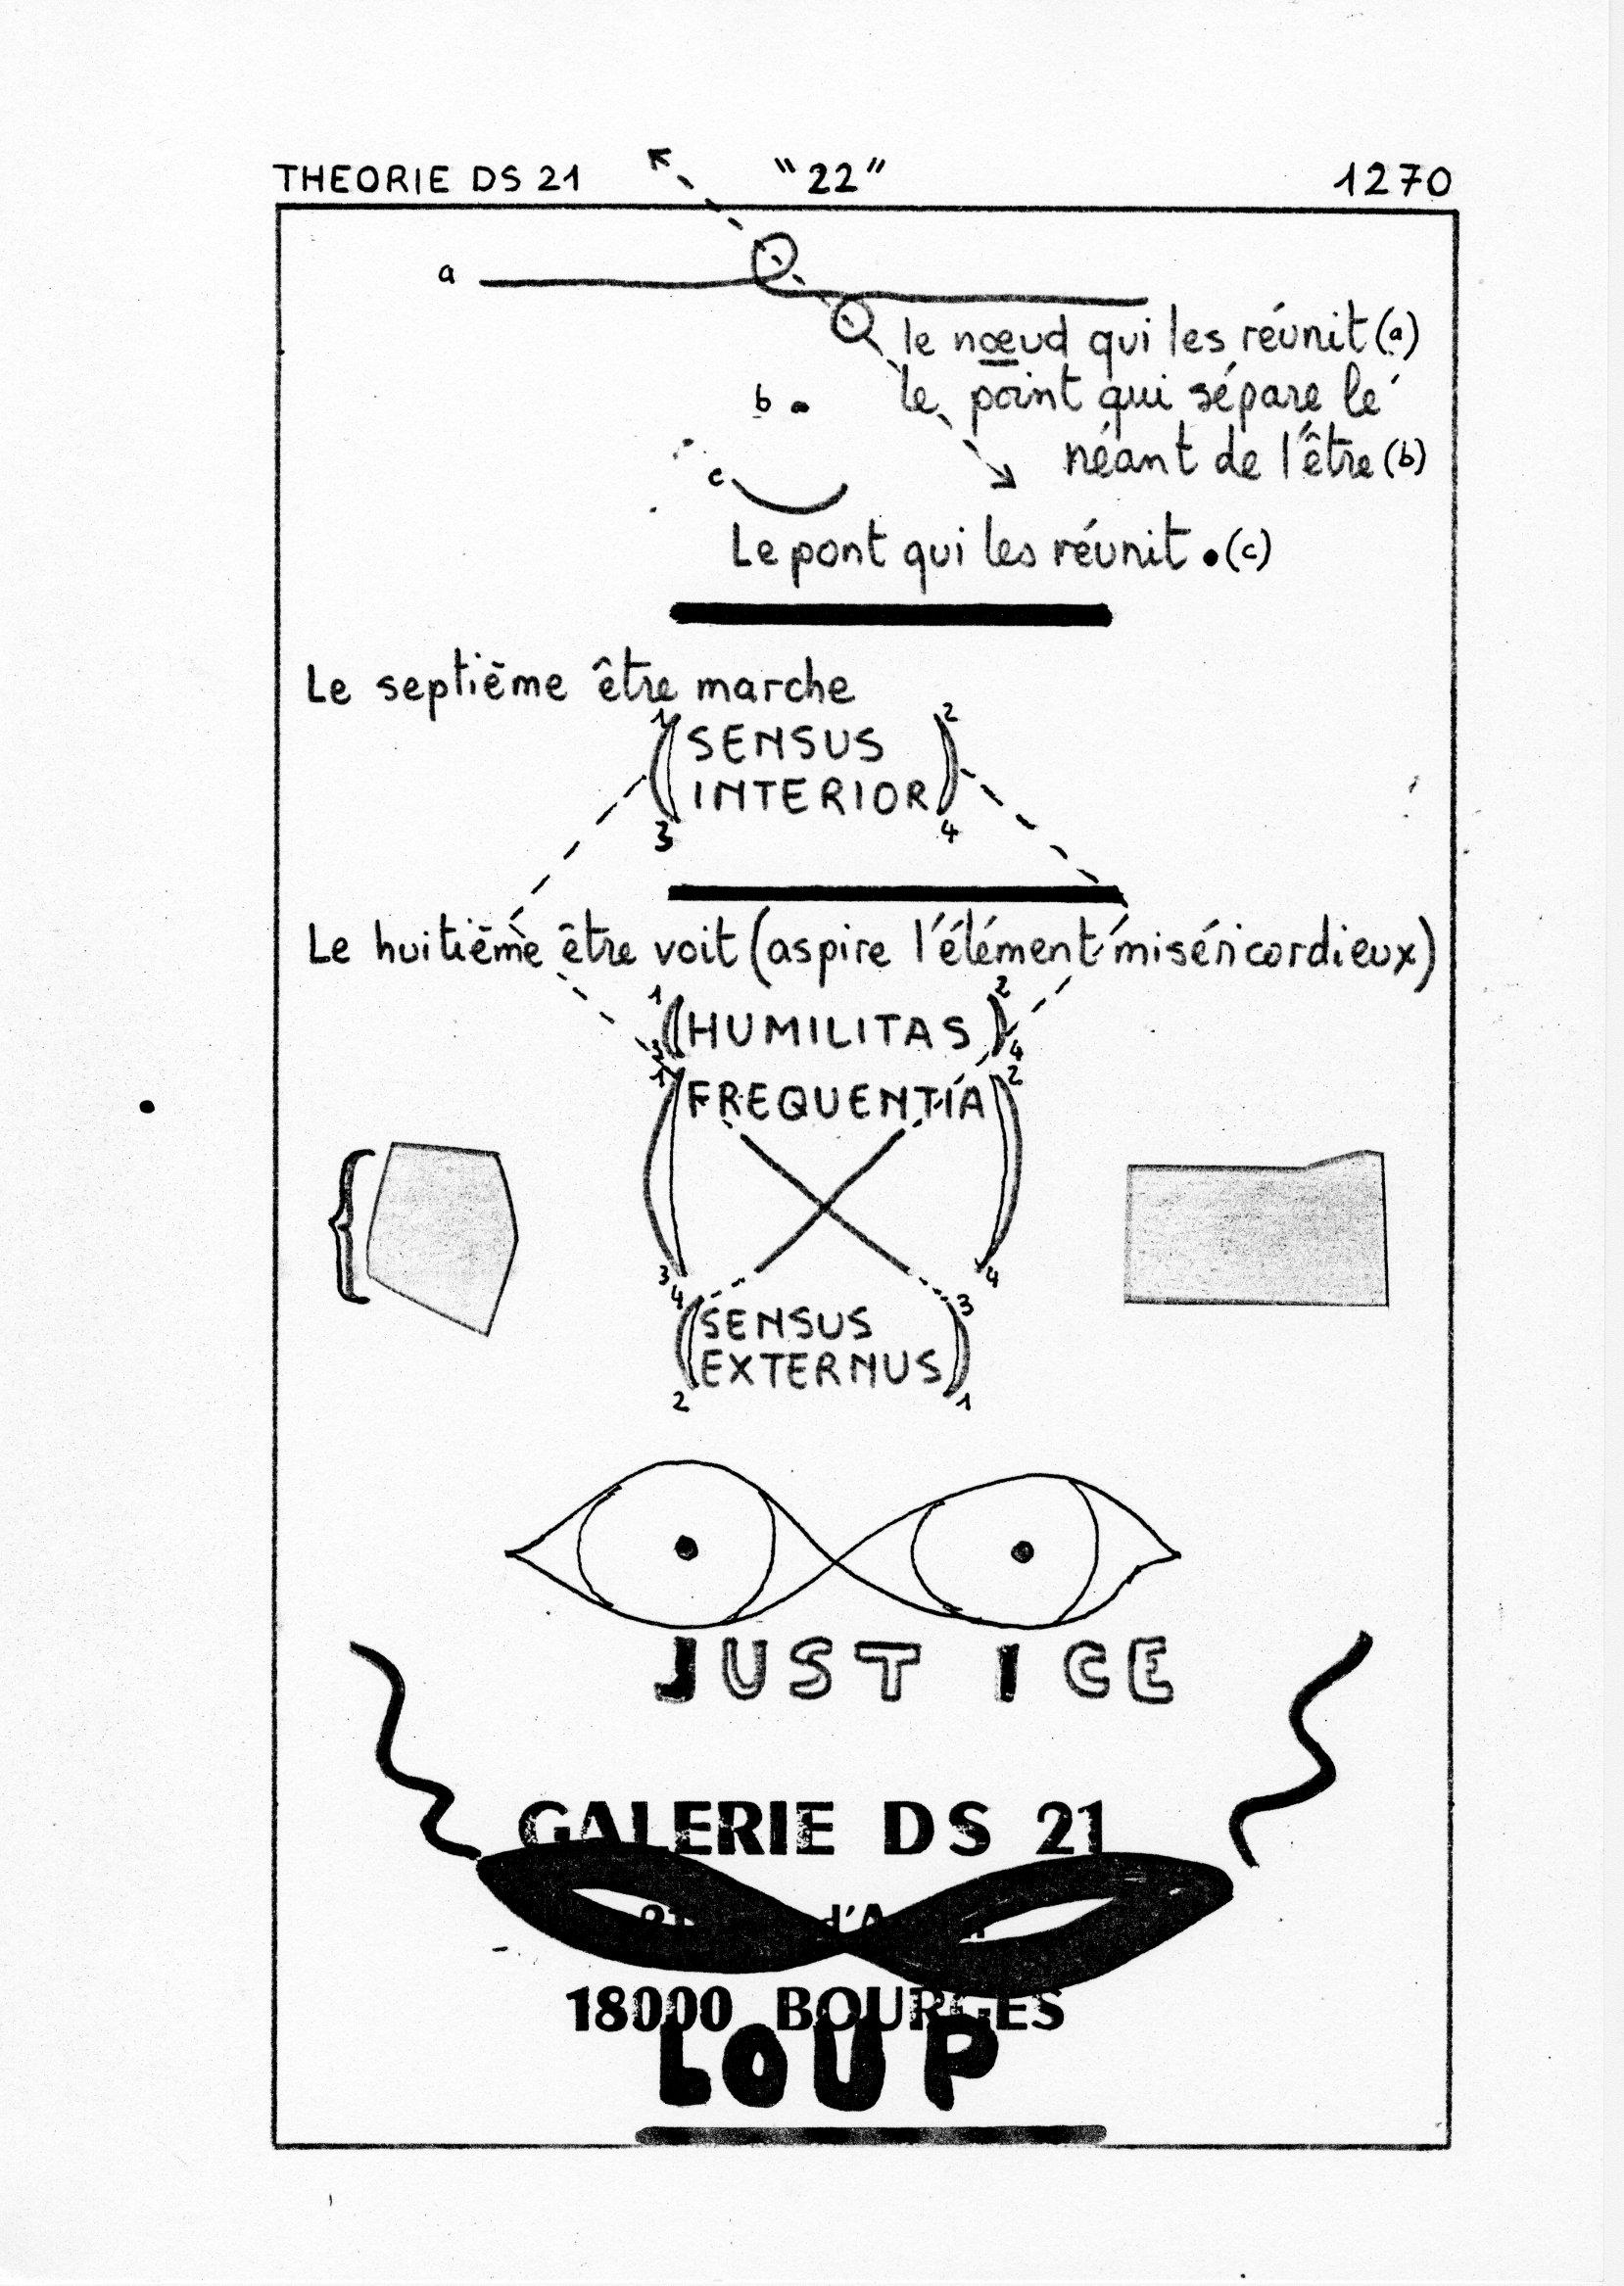 page 1270 Théorie D.S. 21 22